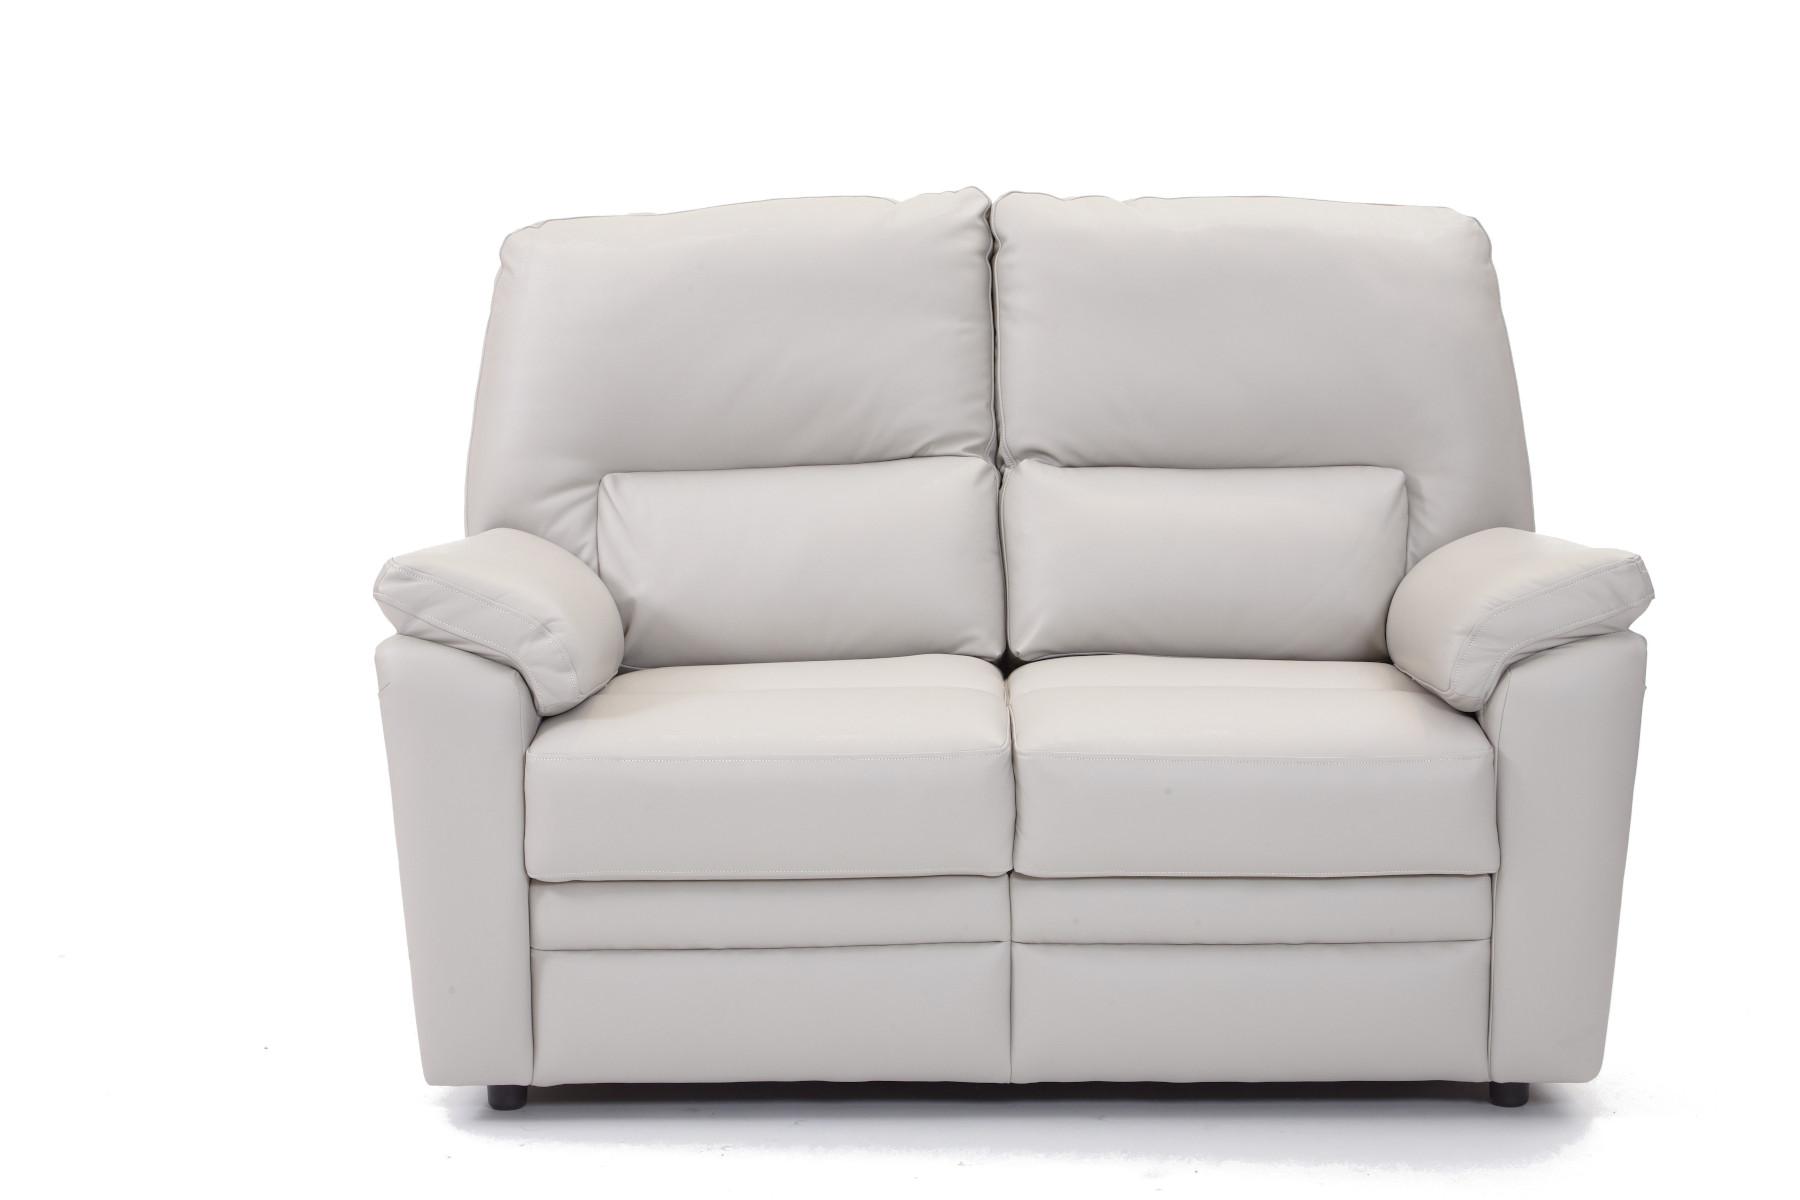 Parker Knoll Hampton 2 Seater Sofa